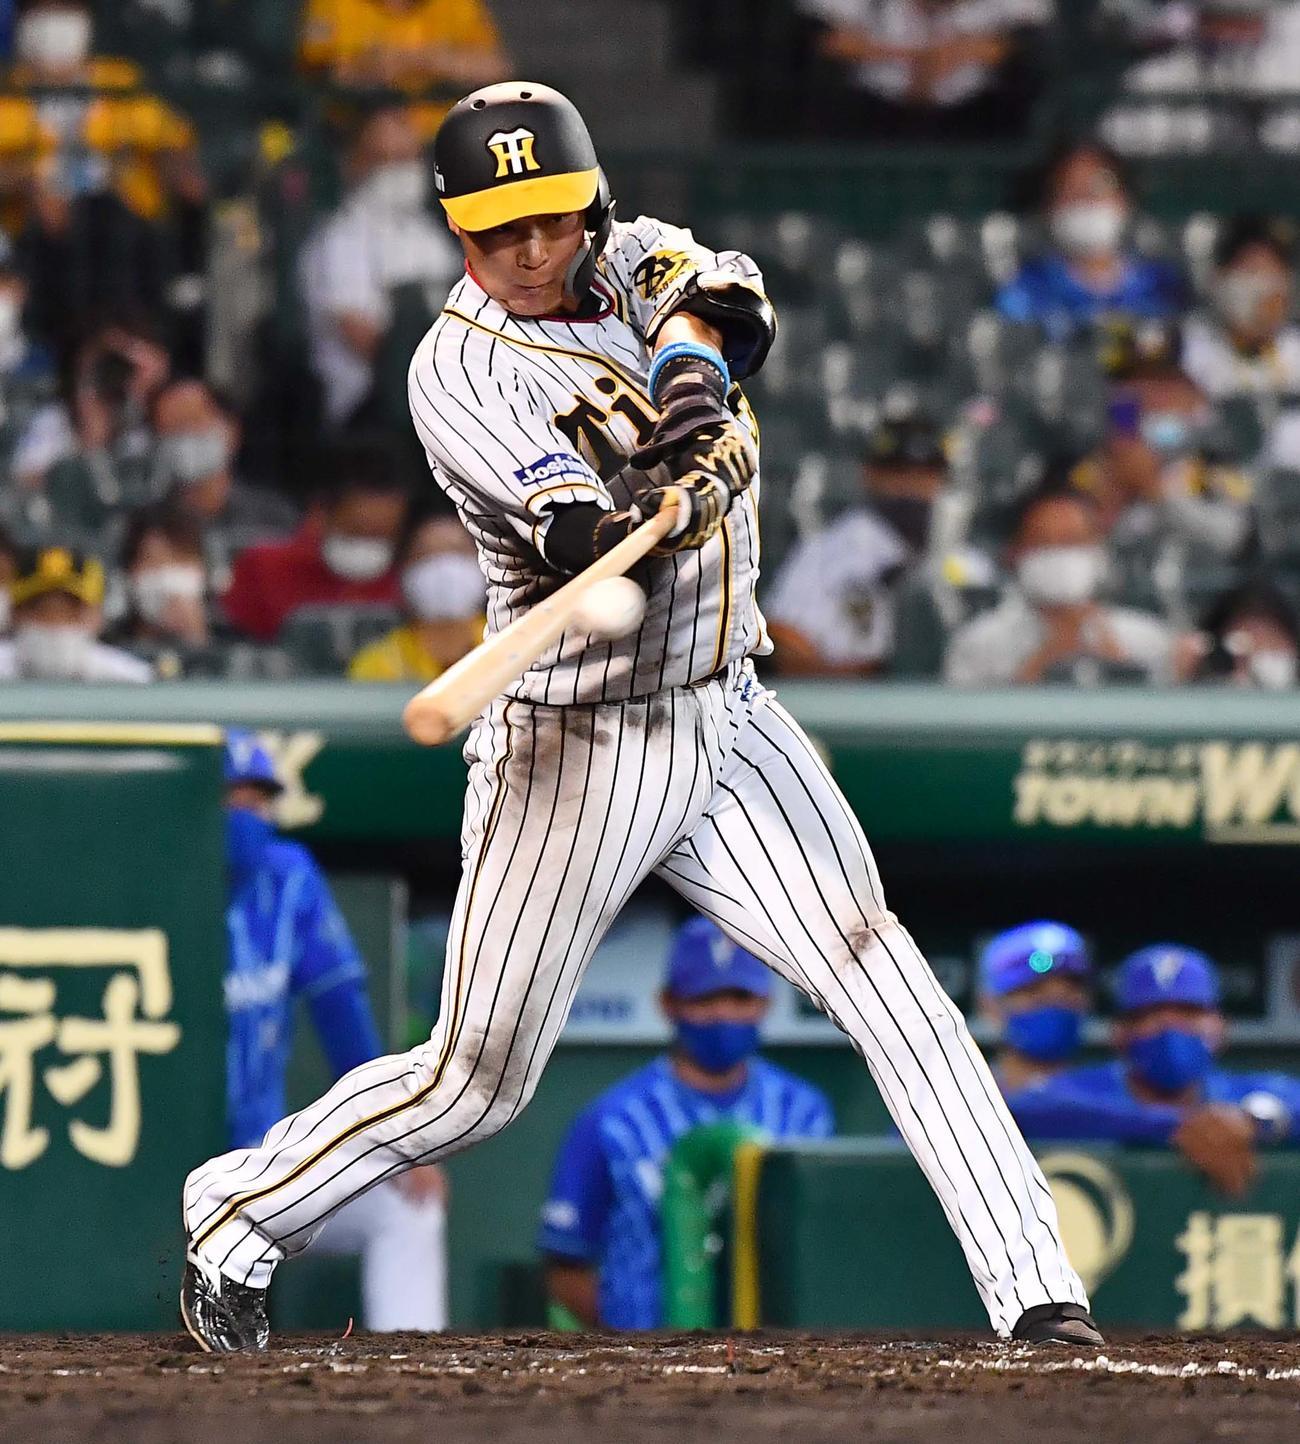 阪神対DeNA 8回裏阪神2死二塁、大山は右翼線に適時二塁打を放つ(撮影・上田博志)